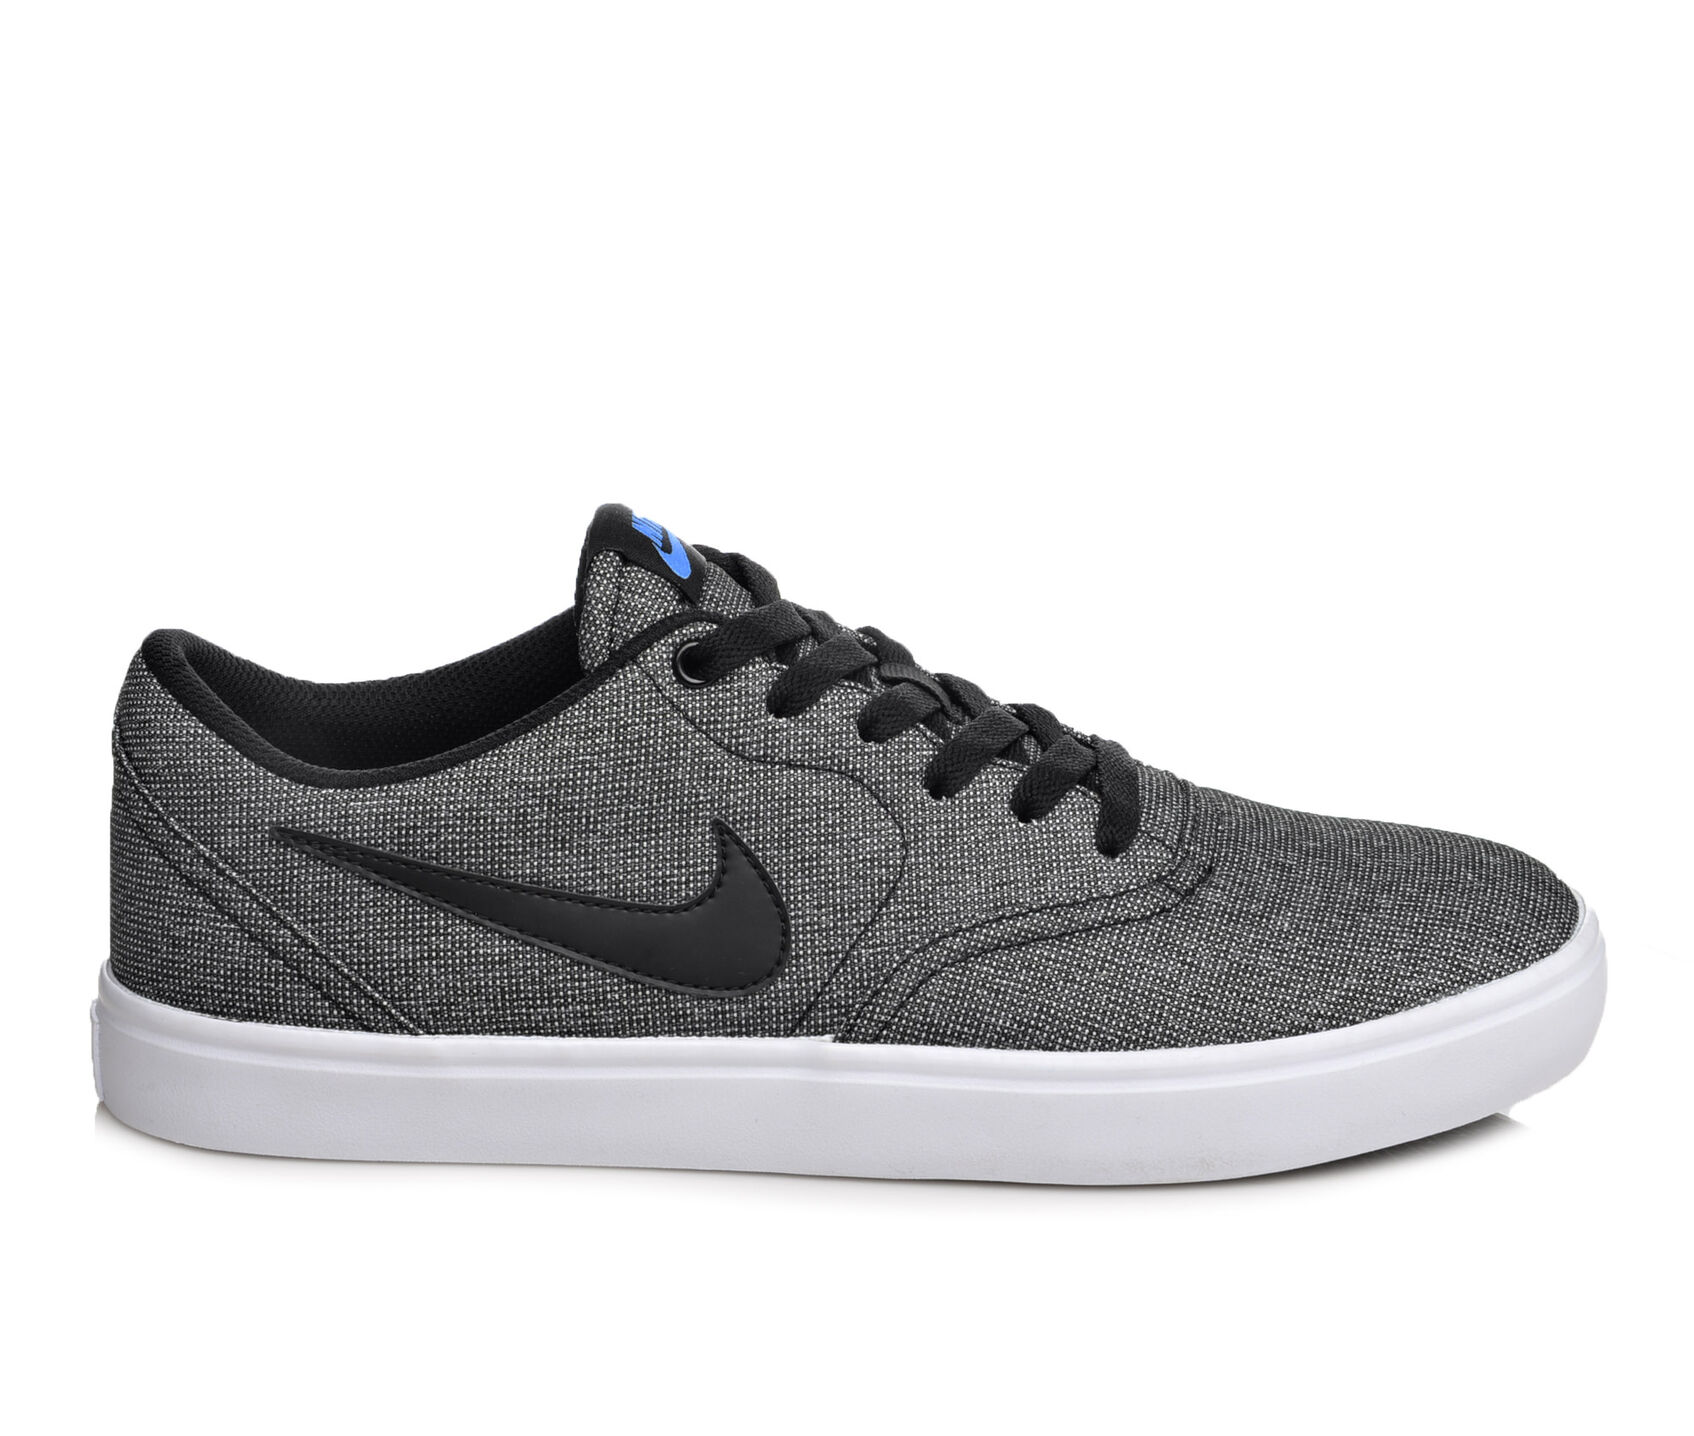 1c370b1df94e32 ... Nike SB Check Solar Canvas Skate Shoes. Previous